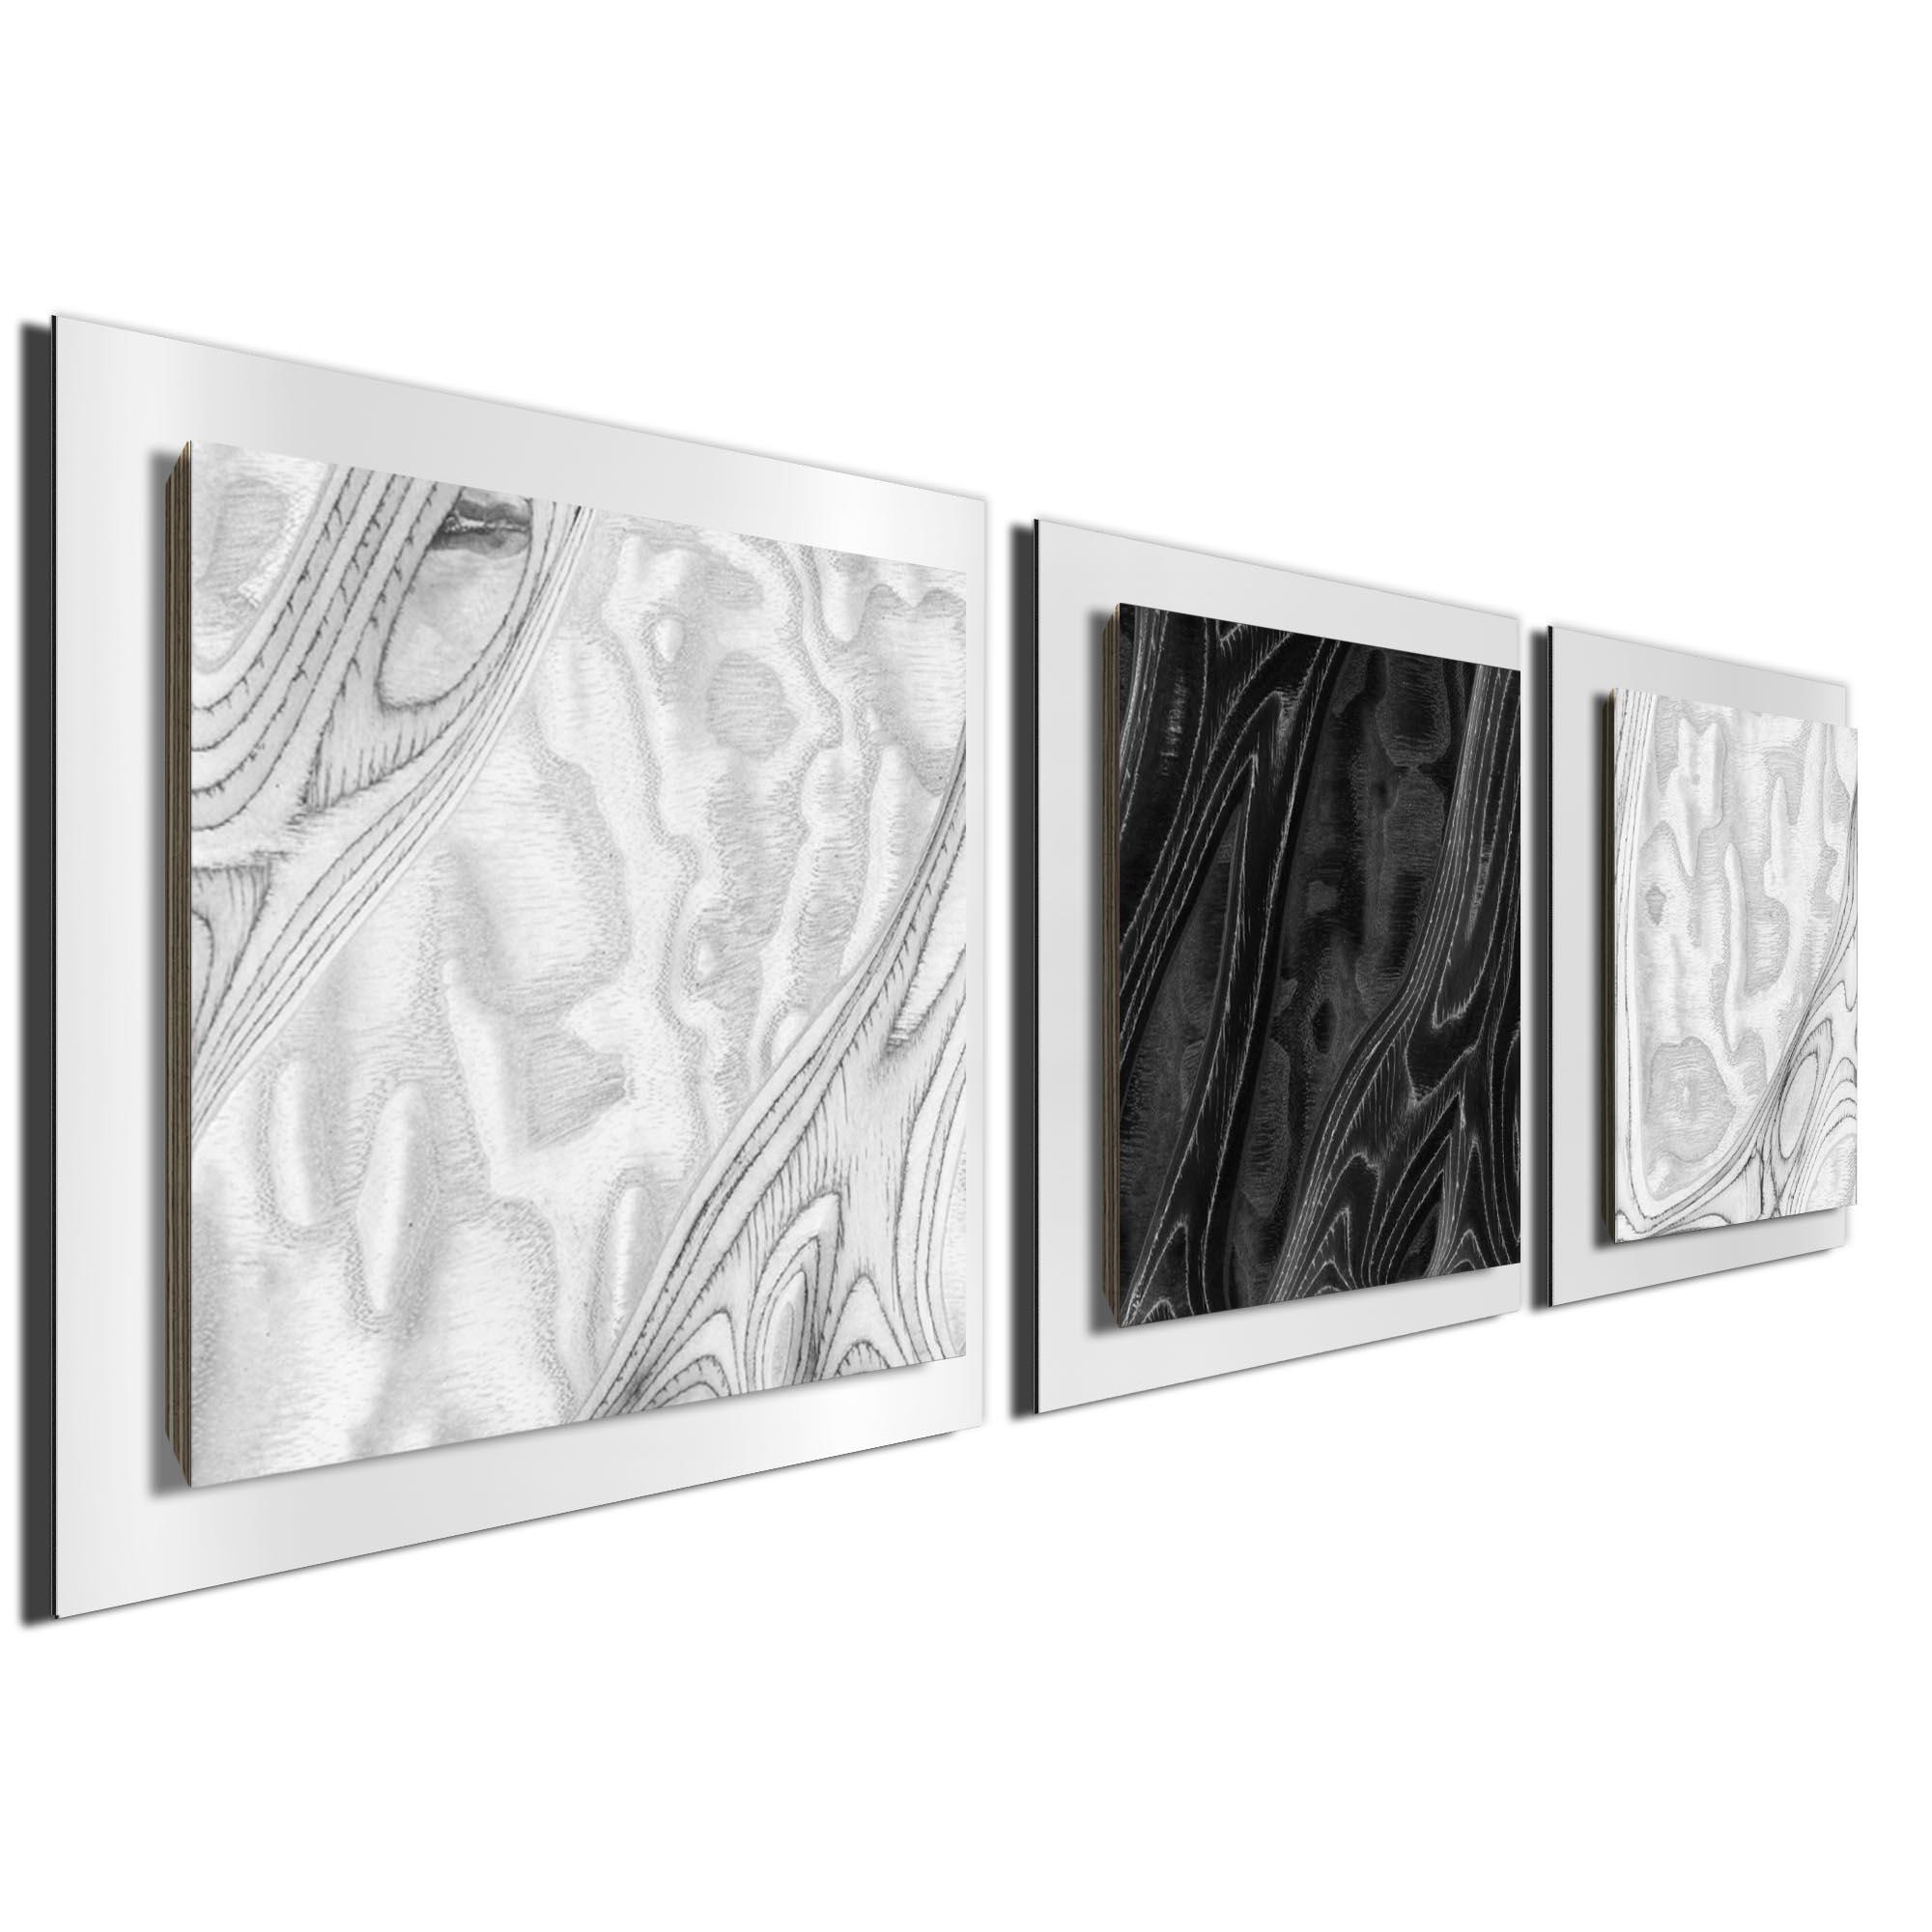 WBW Burl Essence White by Jackson Wright Rustic Modern Style Wood Wall Art - Image 2